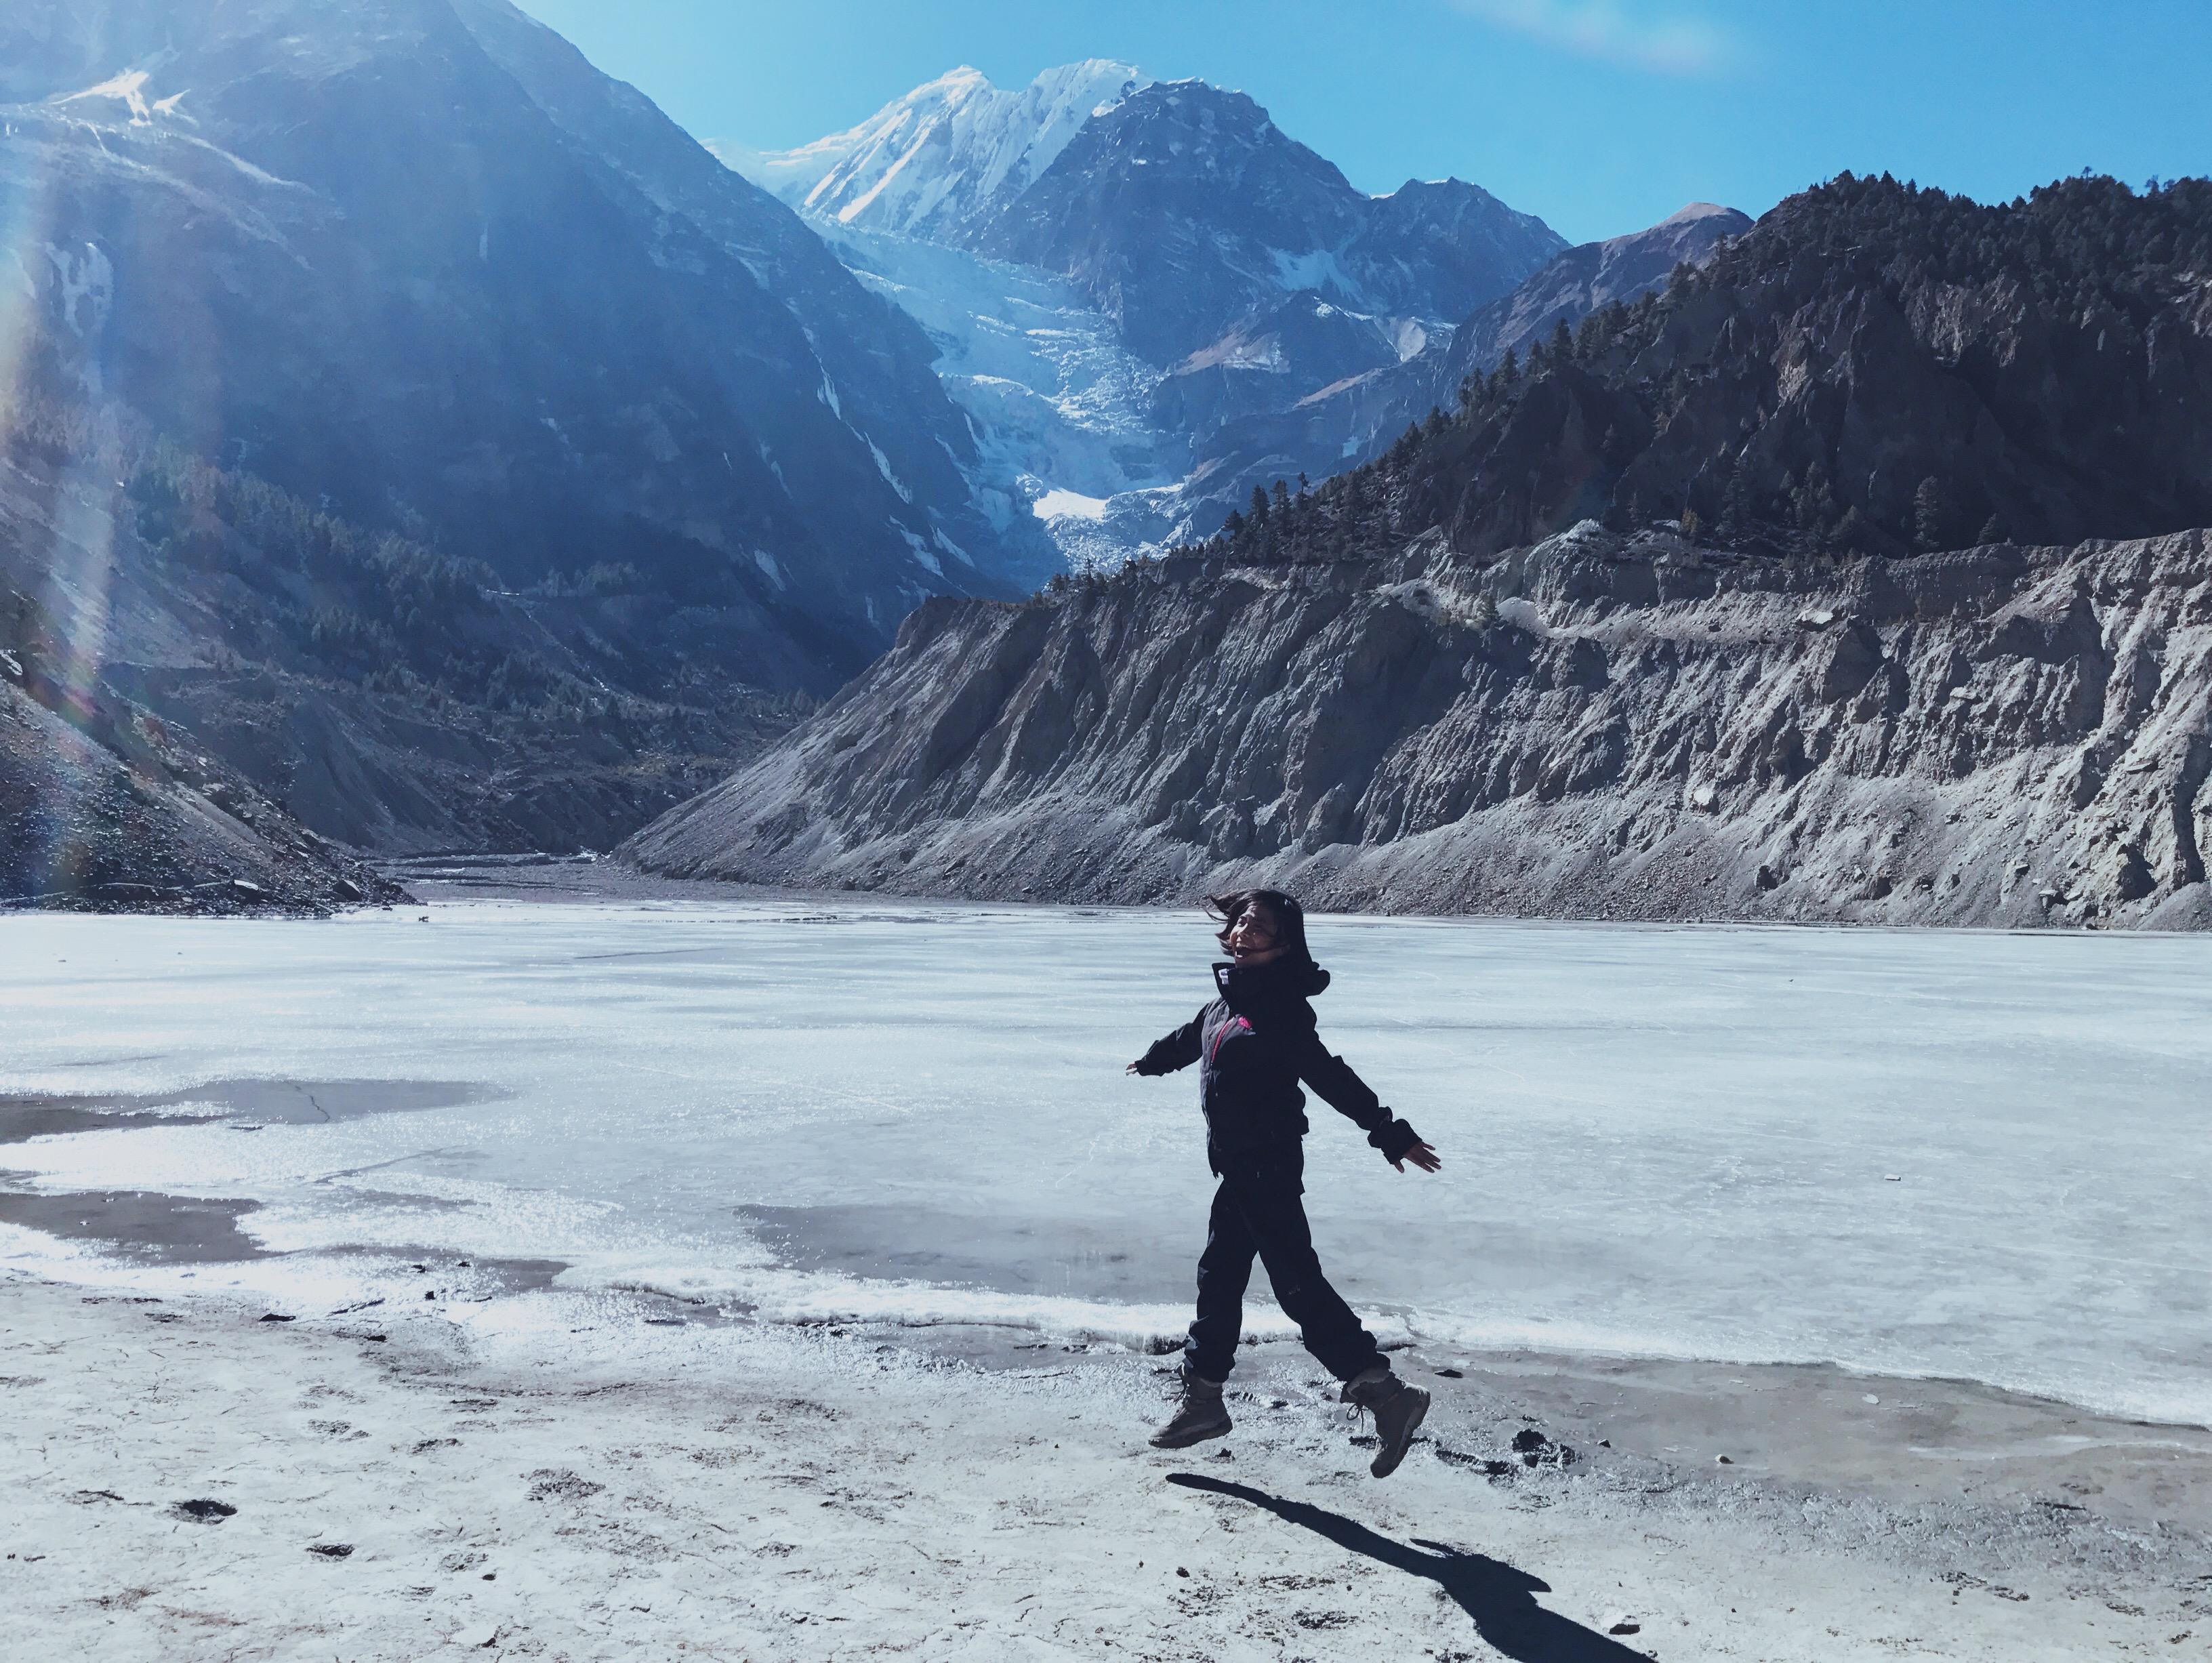 Gangapurna Lake, Annapurna Circuit Trek, Nepal